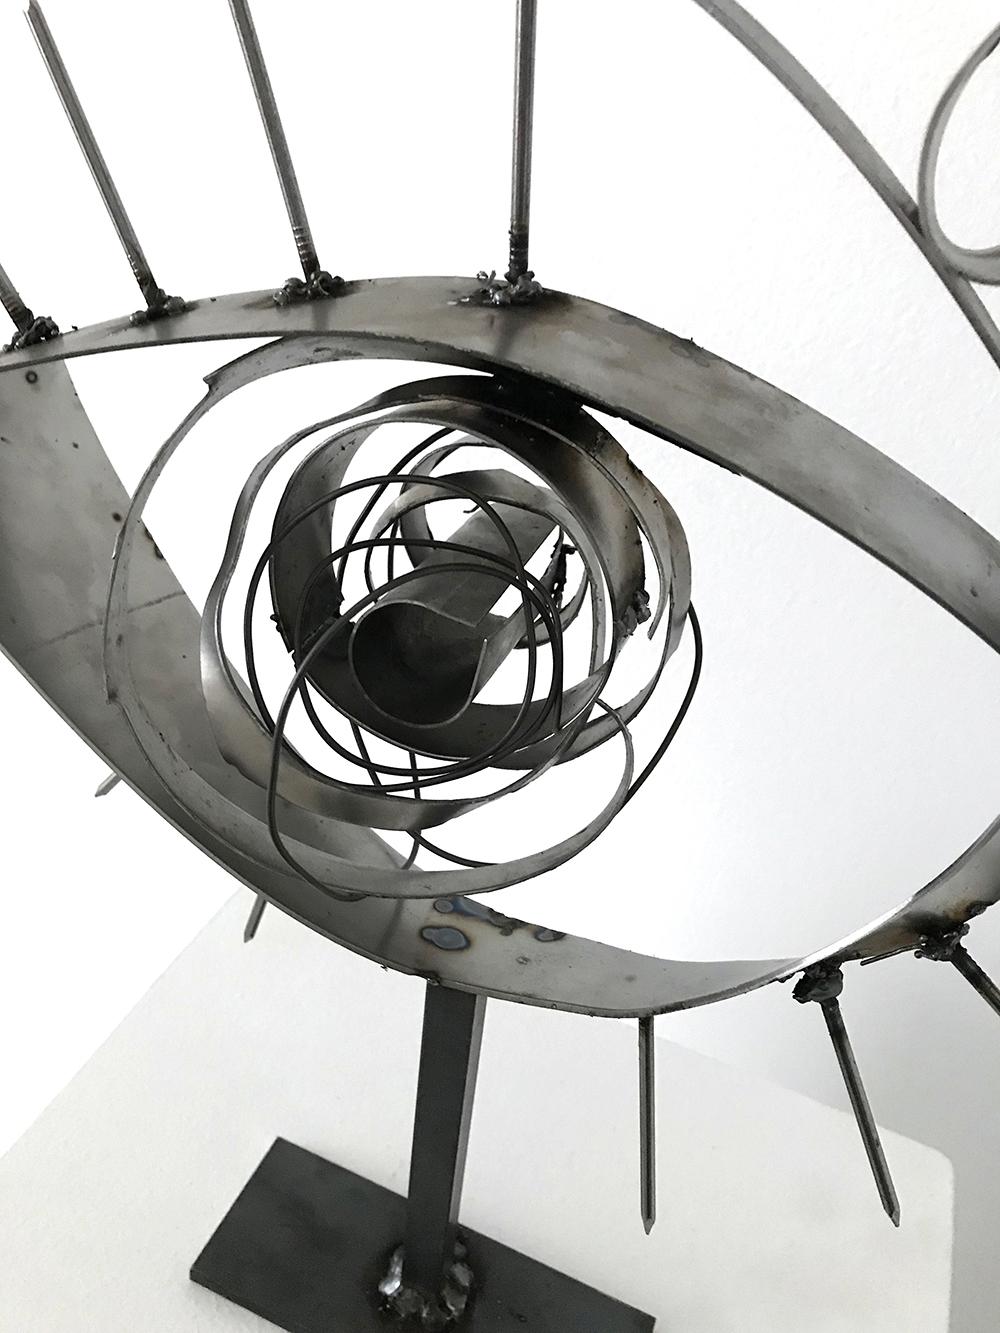 Indira-Cesarine-22ONLY-YOU-No-100022-steel-sculpture-detail-@72-x-1000-copy.jpg